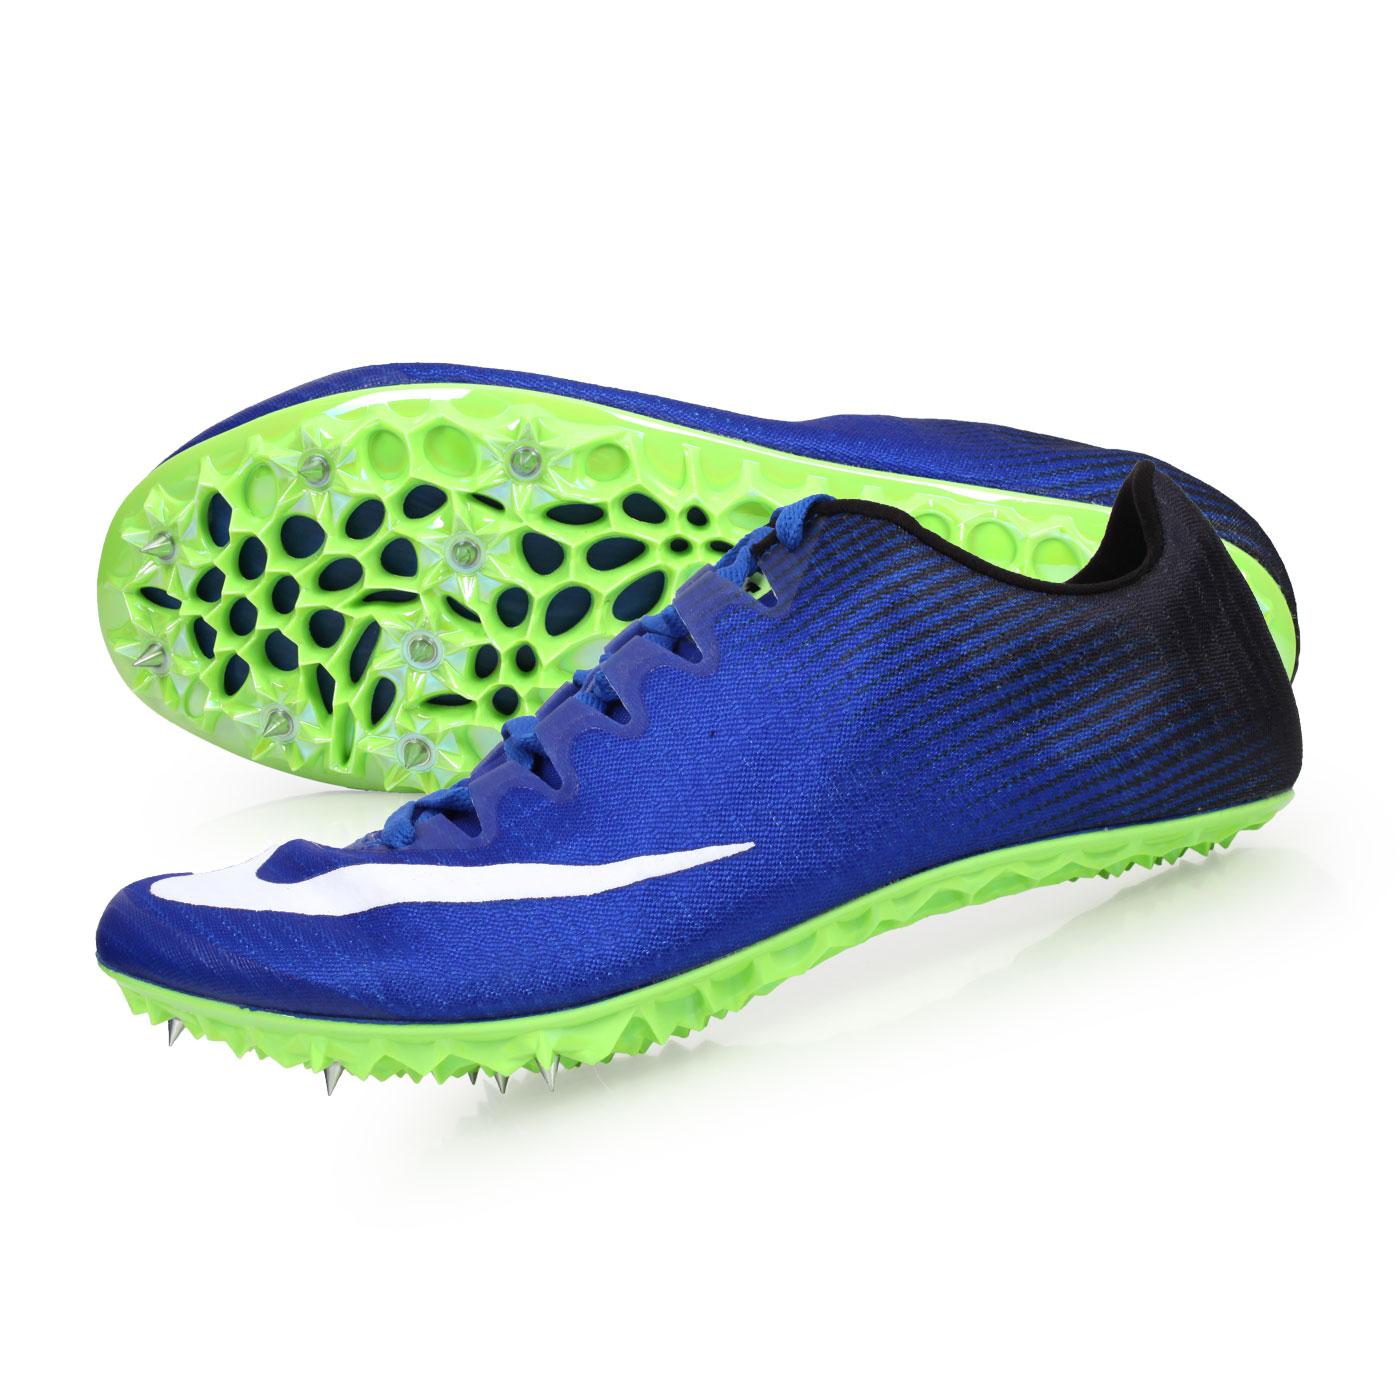 NIKE 田徑釘鞋(短距離)  @ZOOM SUPERFLY ELITE@835996001 - 藍黑白